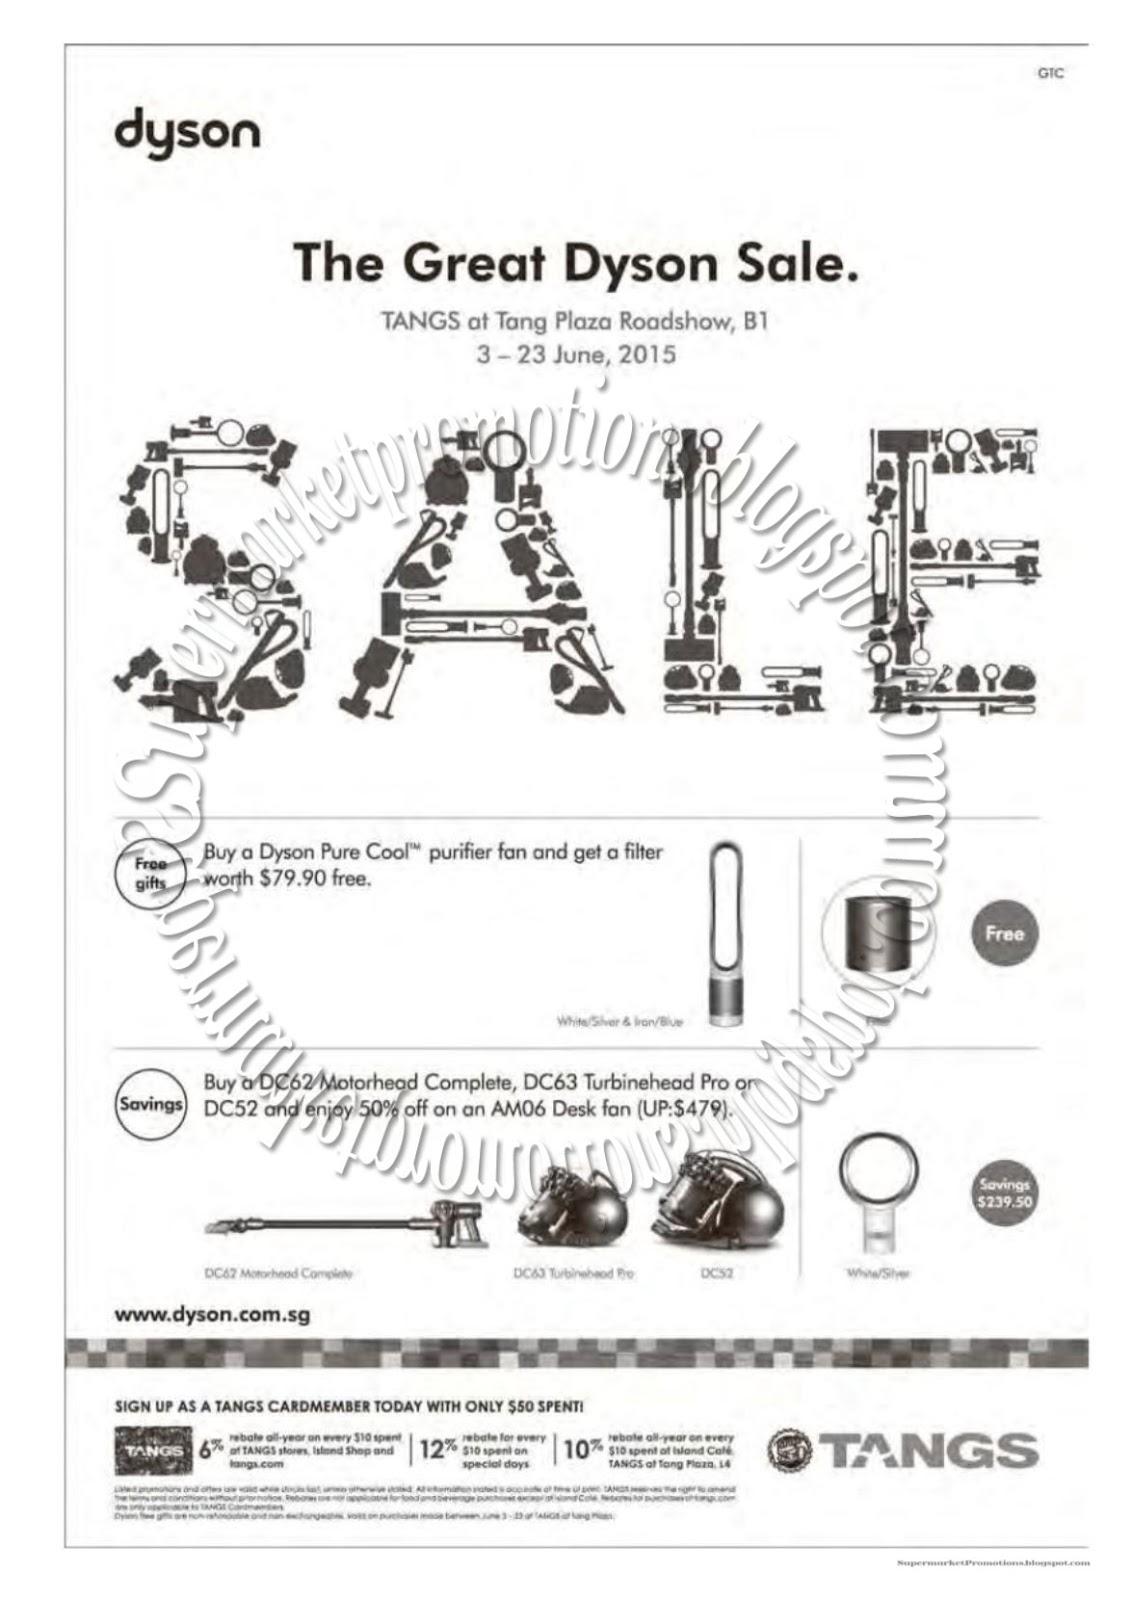 Dyson coupon code